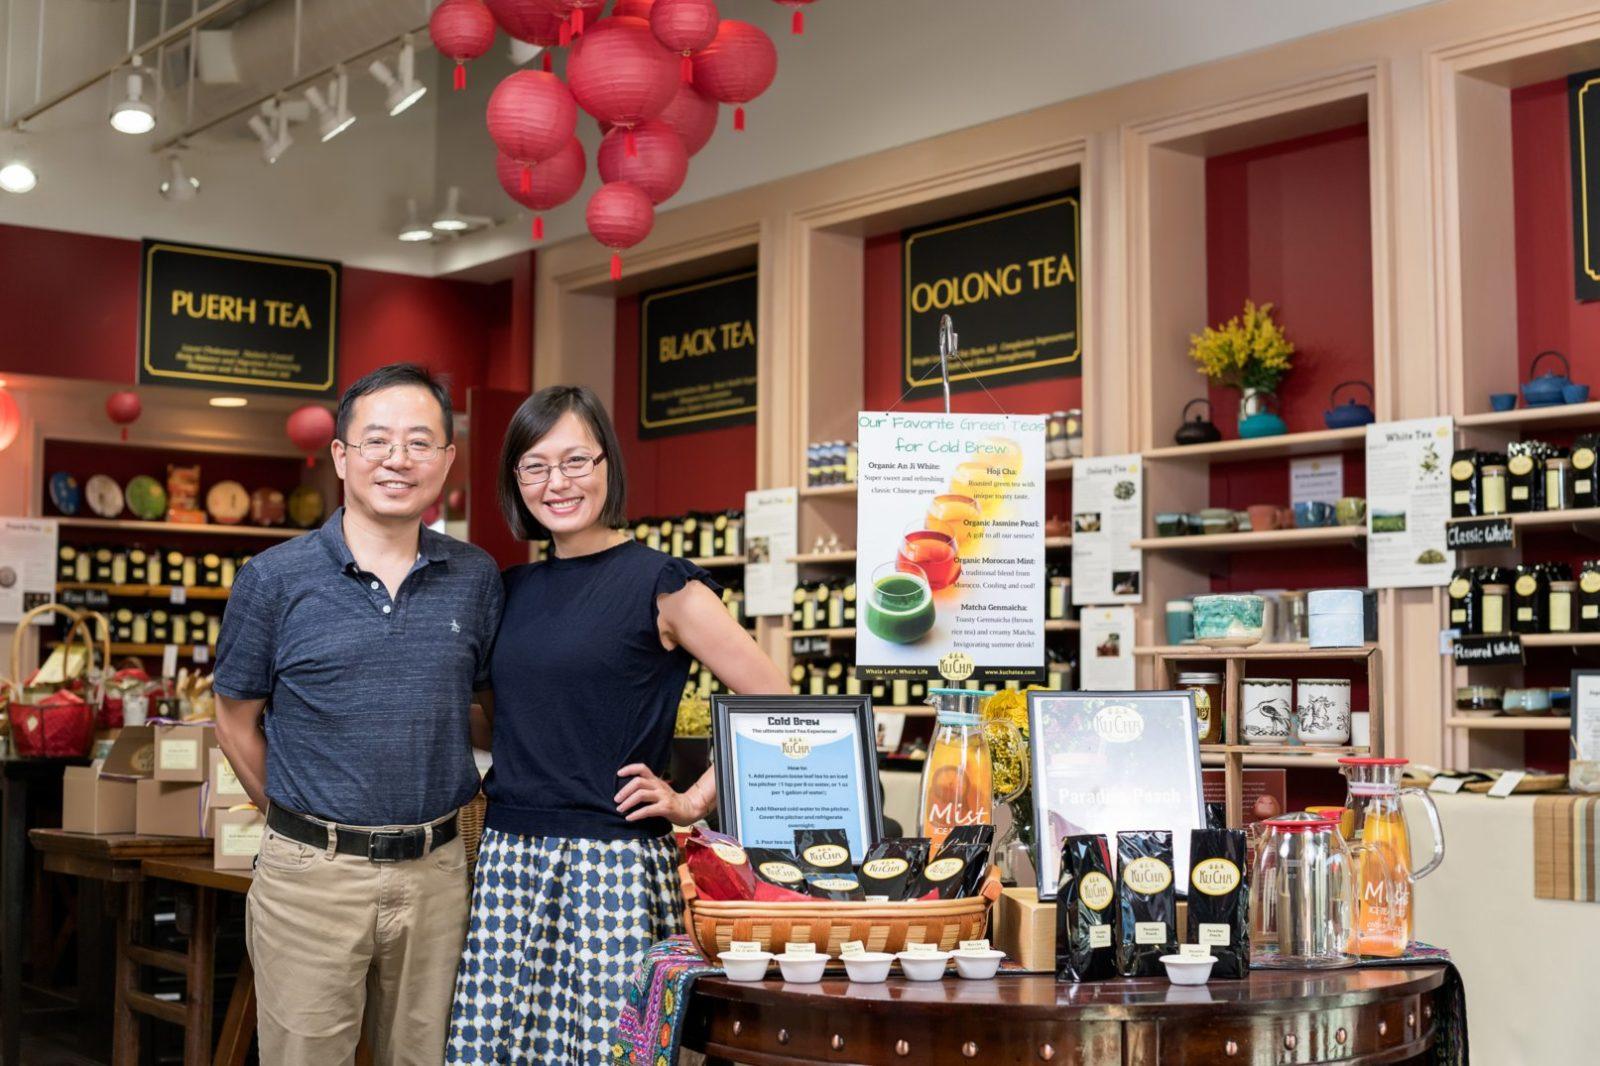 For fifteen years Ku Cha House of Tea has sold loose-leaf tea to Coloradans.